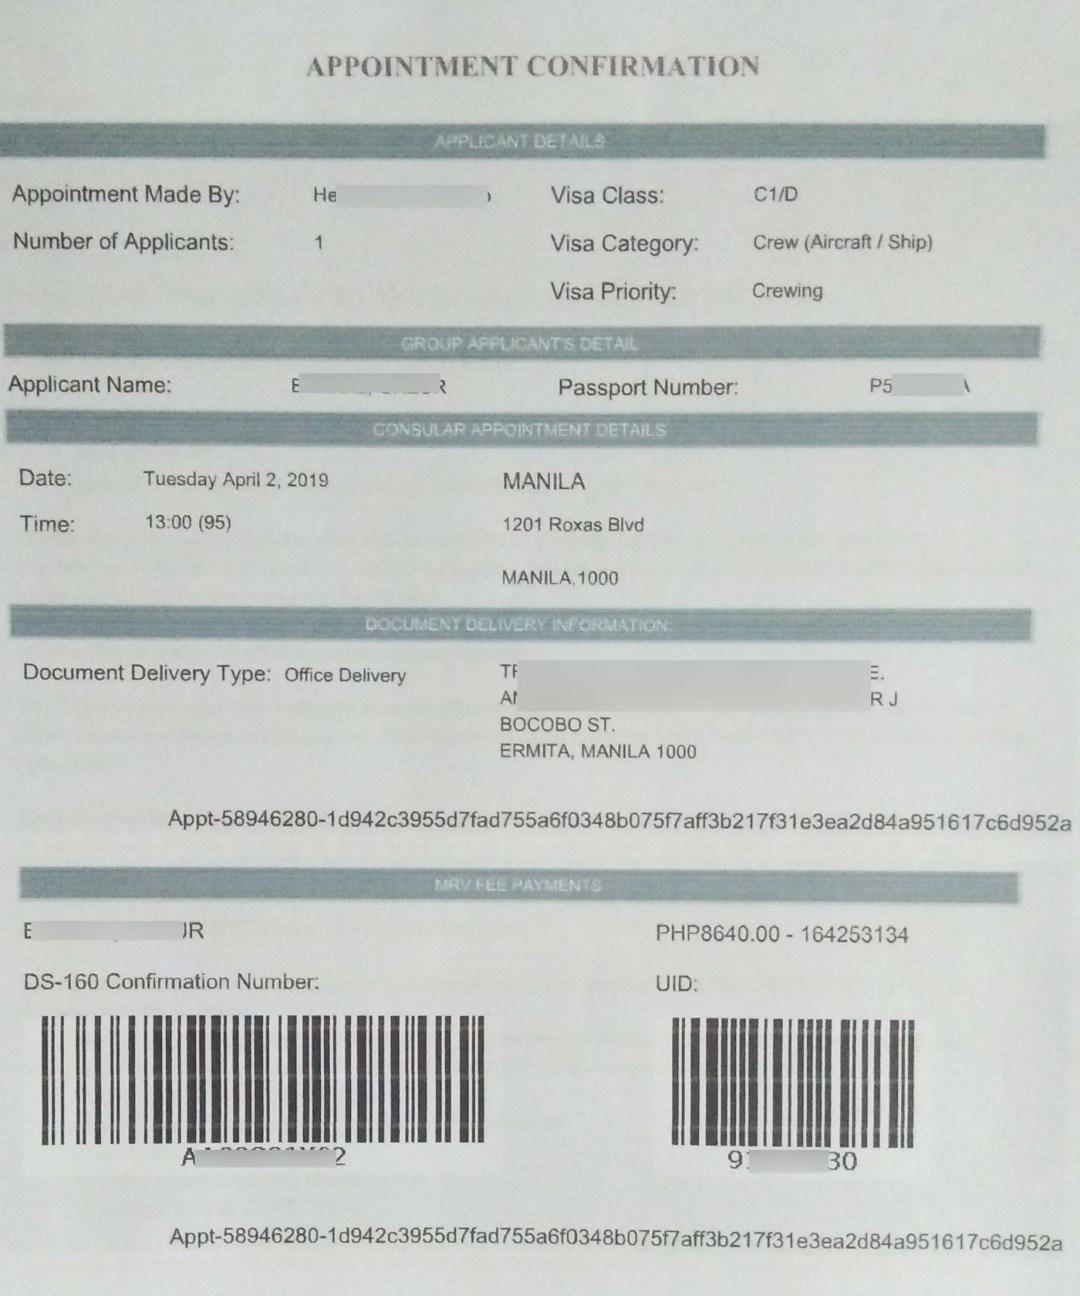 Us Visa For Seafarers Application And Renewal Guide